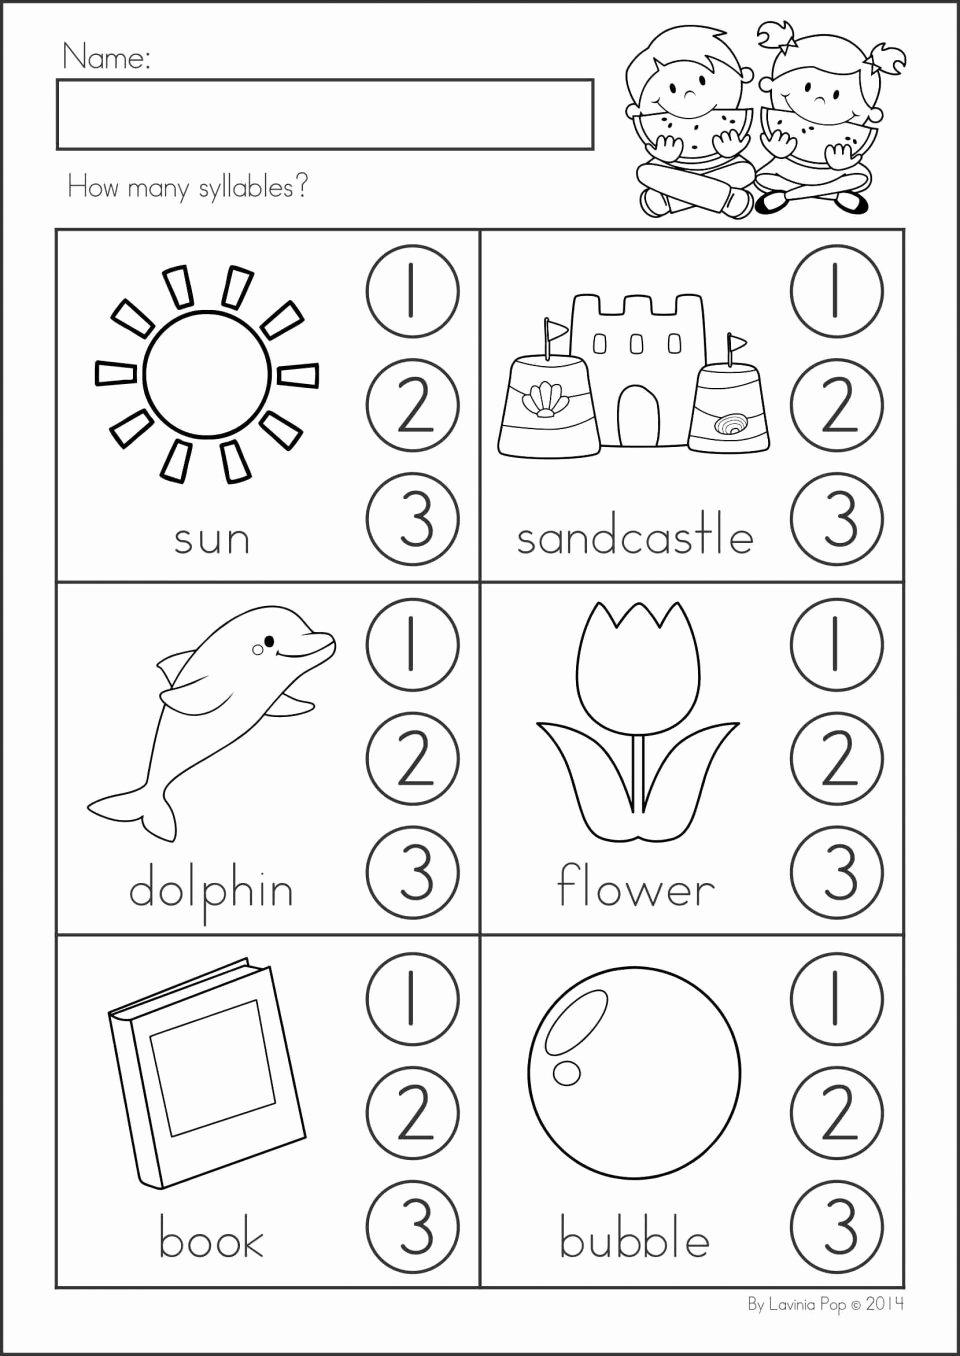 Math Concept Worksheets for Preschoolers Kids Worksheet Kindergarten Activity Sheets Worksheet Grade